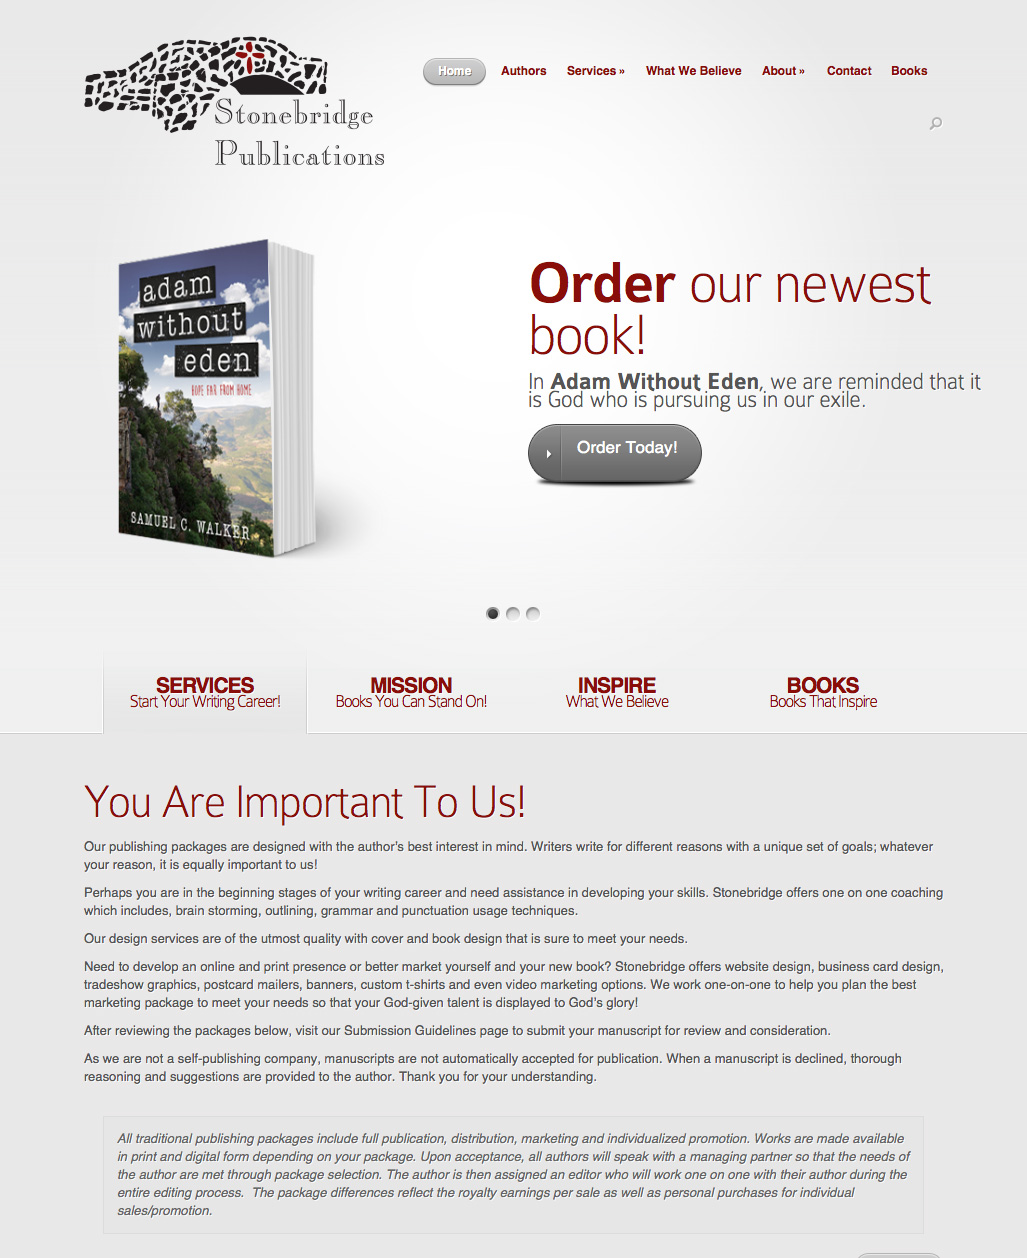 Stonebridge Publications